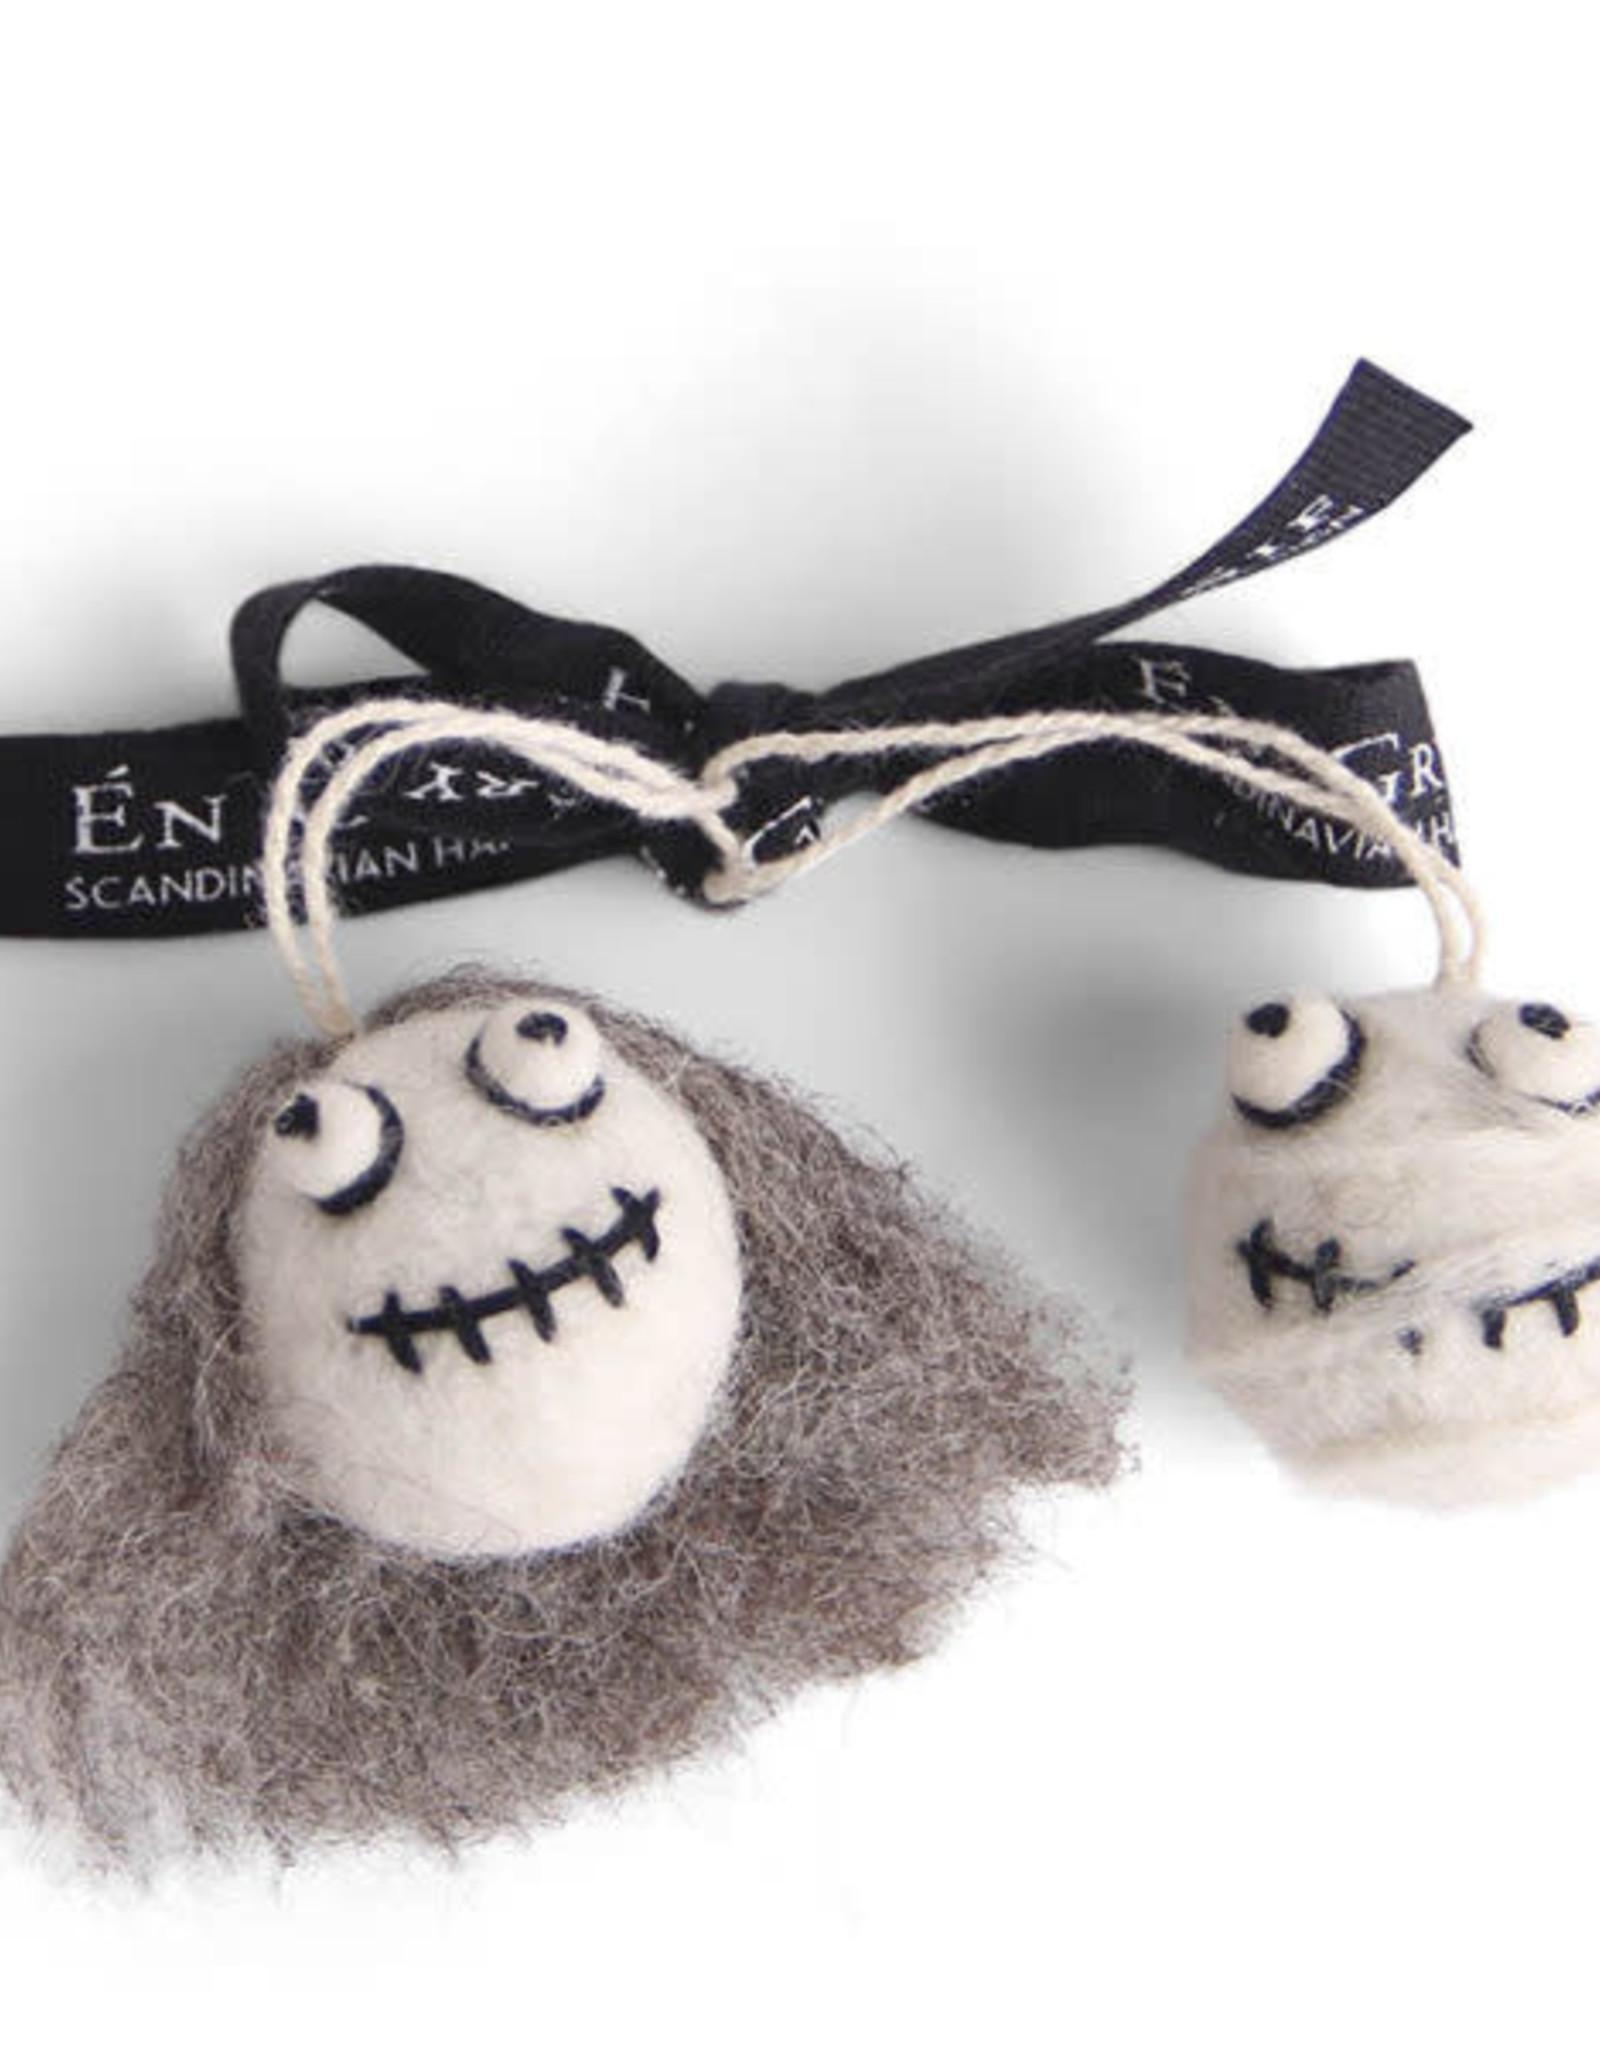 EGS EGS Ornament - Mummier & Head Set/2